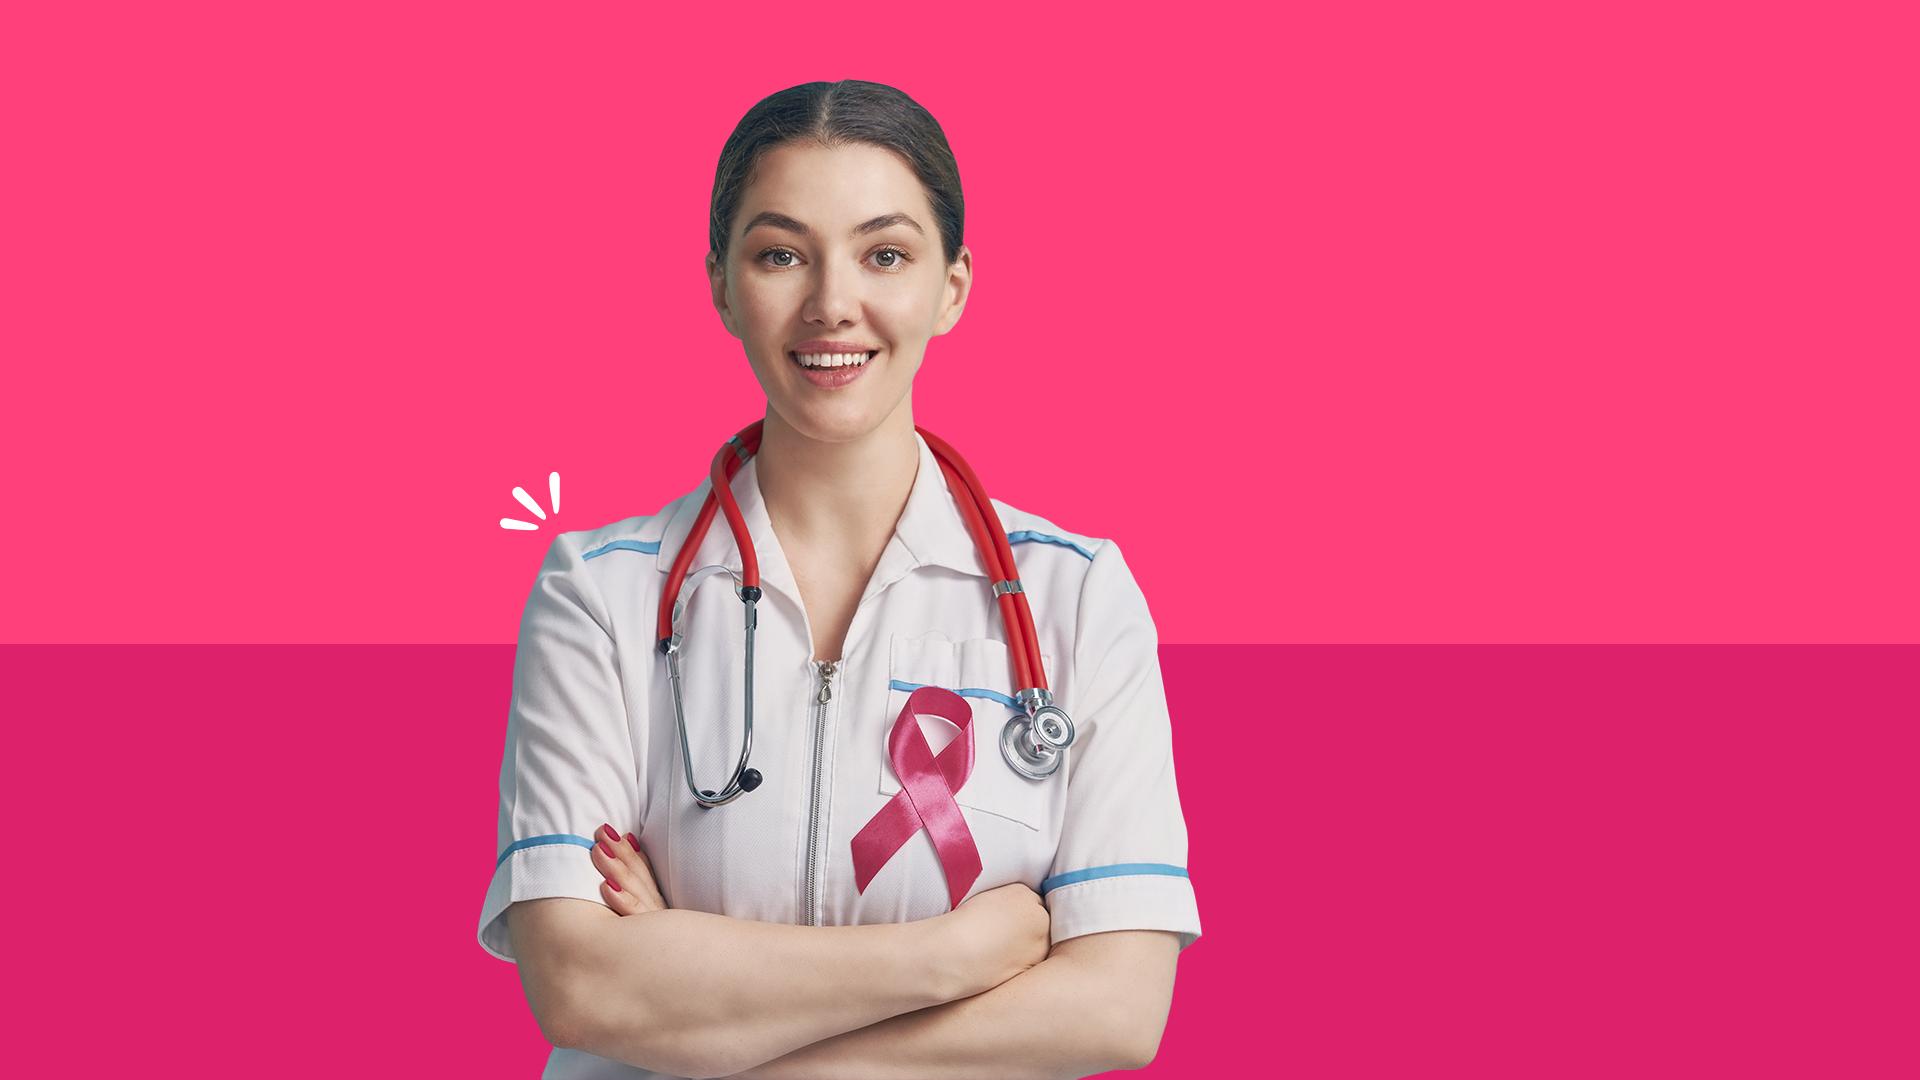 The 3 cancer screenings women need